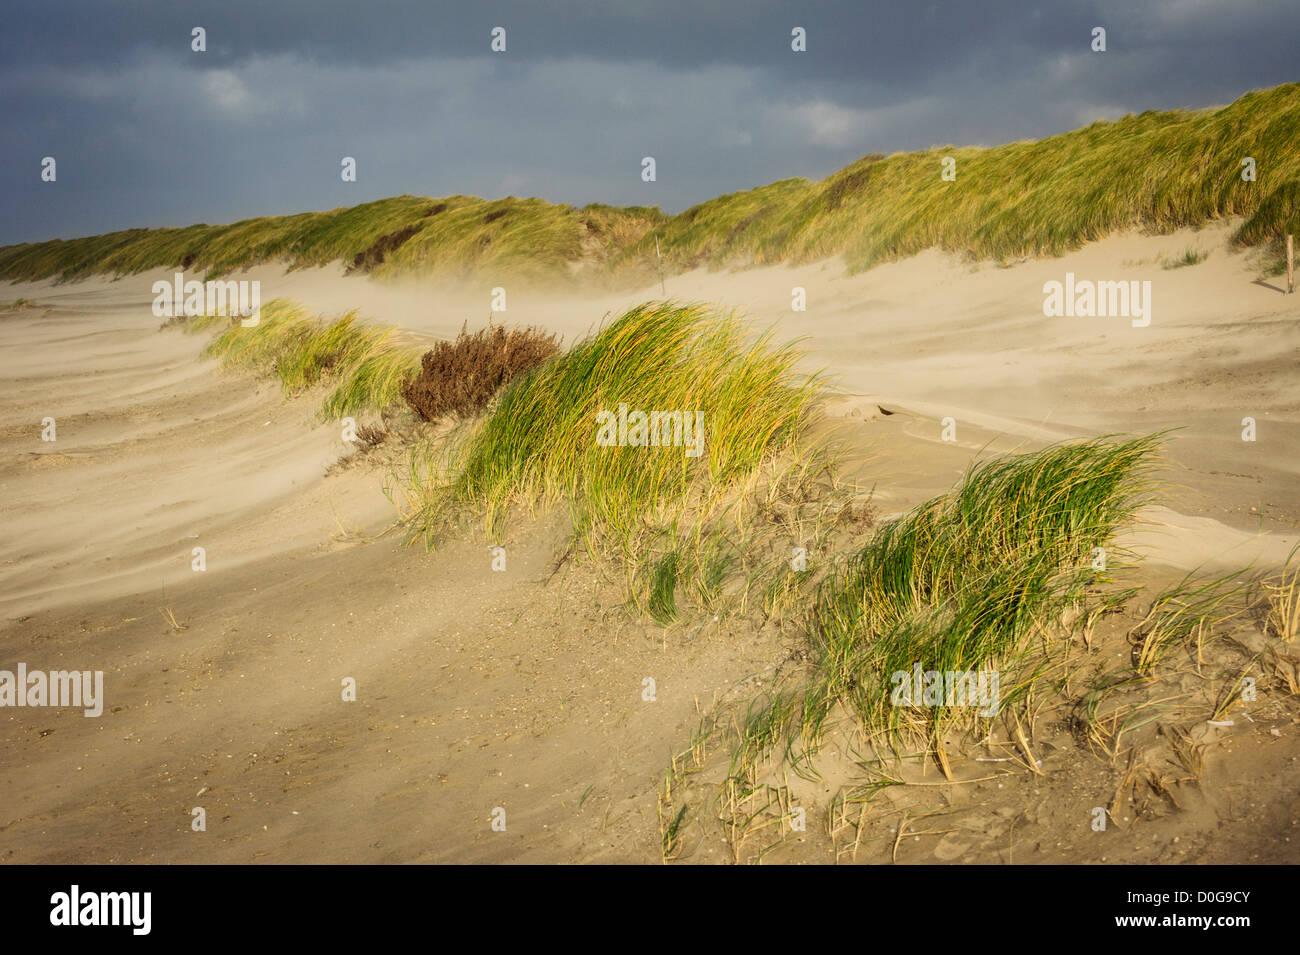 European Marram Grass or European Beachgrass, Ammophila arenaria, dune grasses in storm, Netherlands - Stock Image